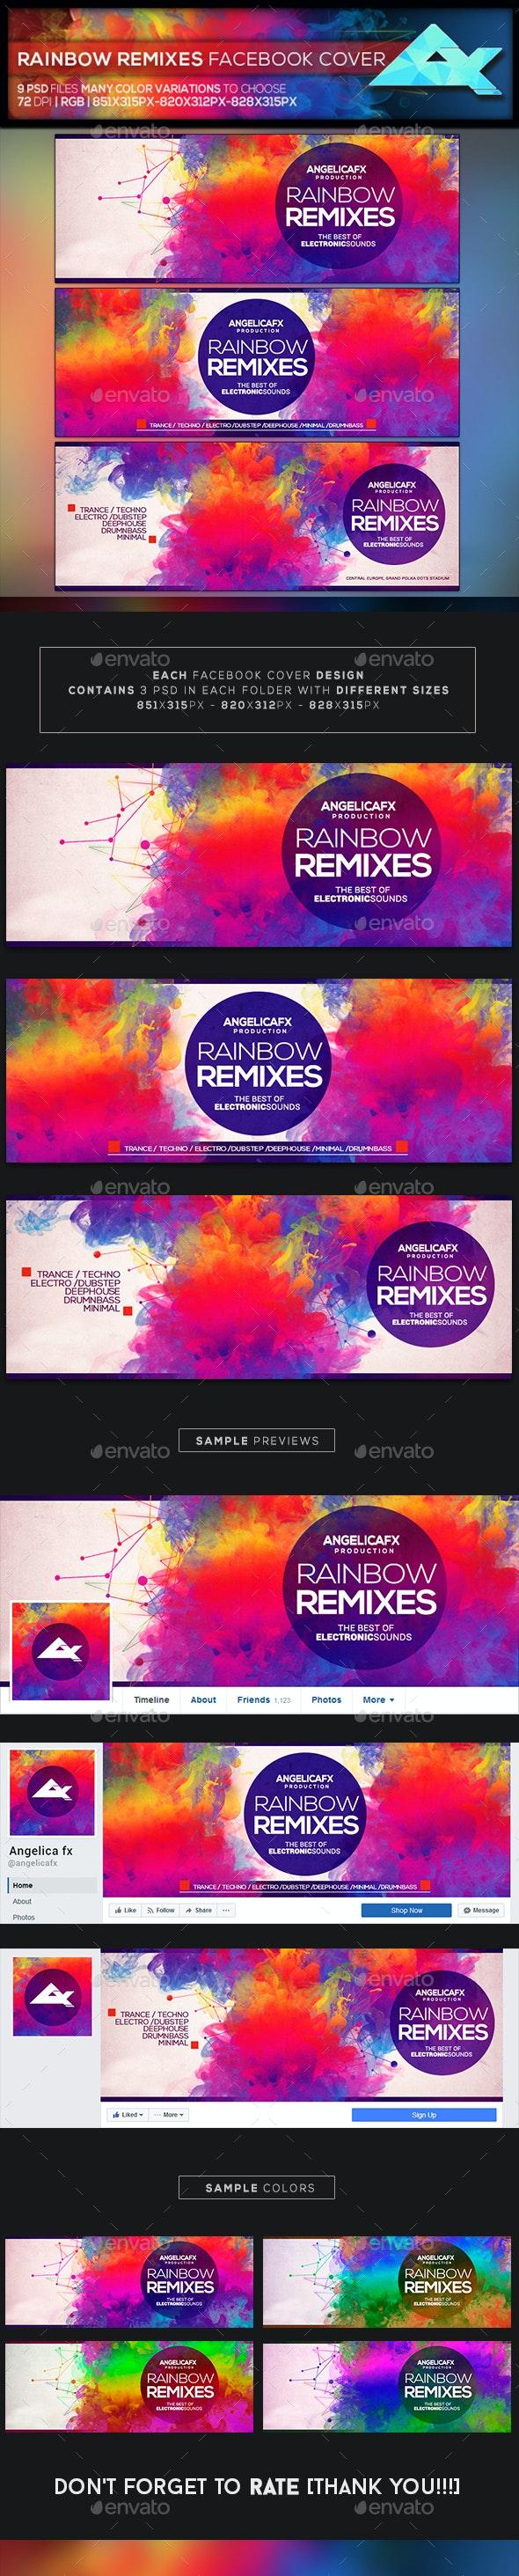 Rainbow Remixes Facebook Cover - Facebook Timeline Covers Social Media